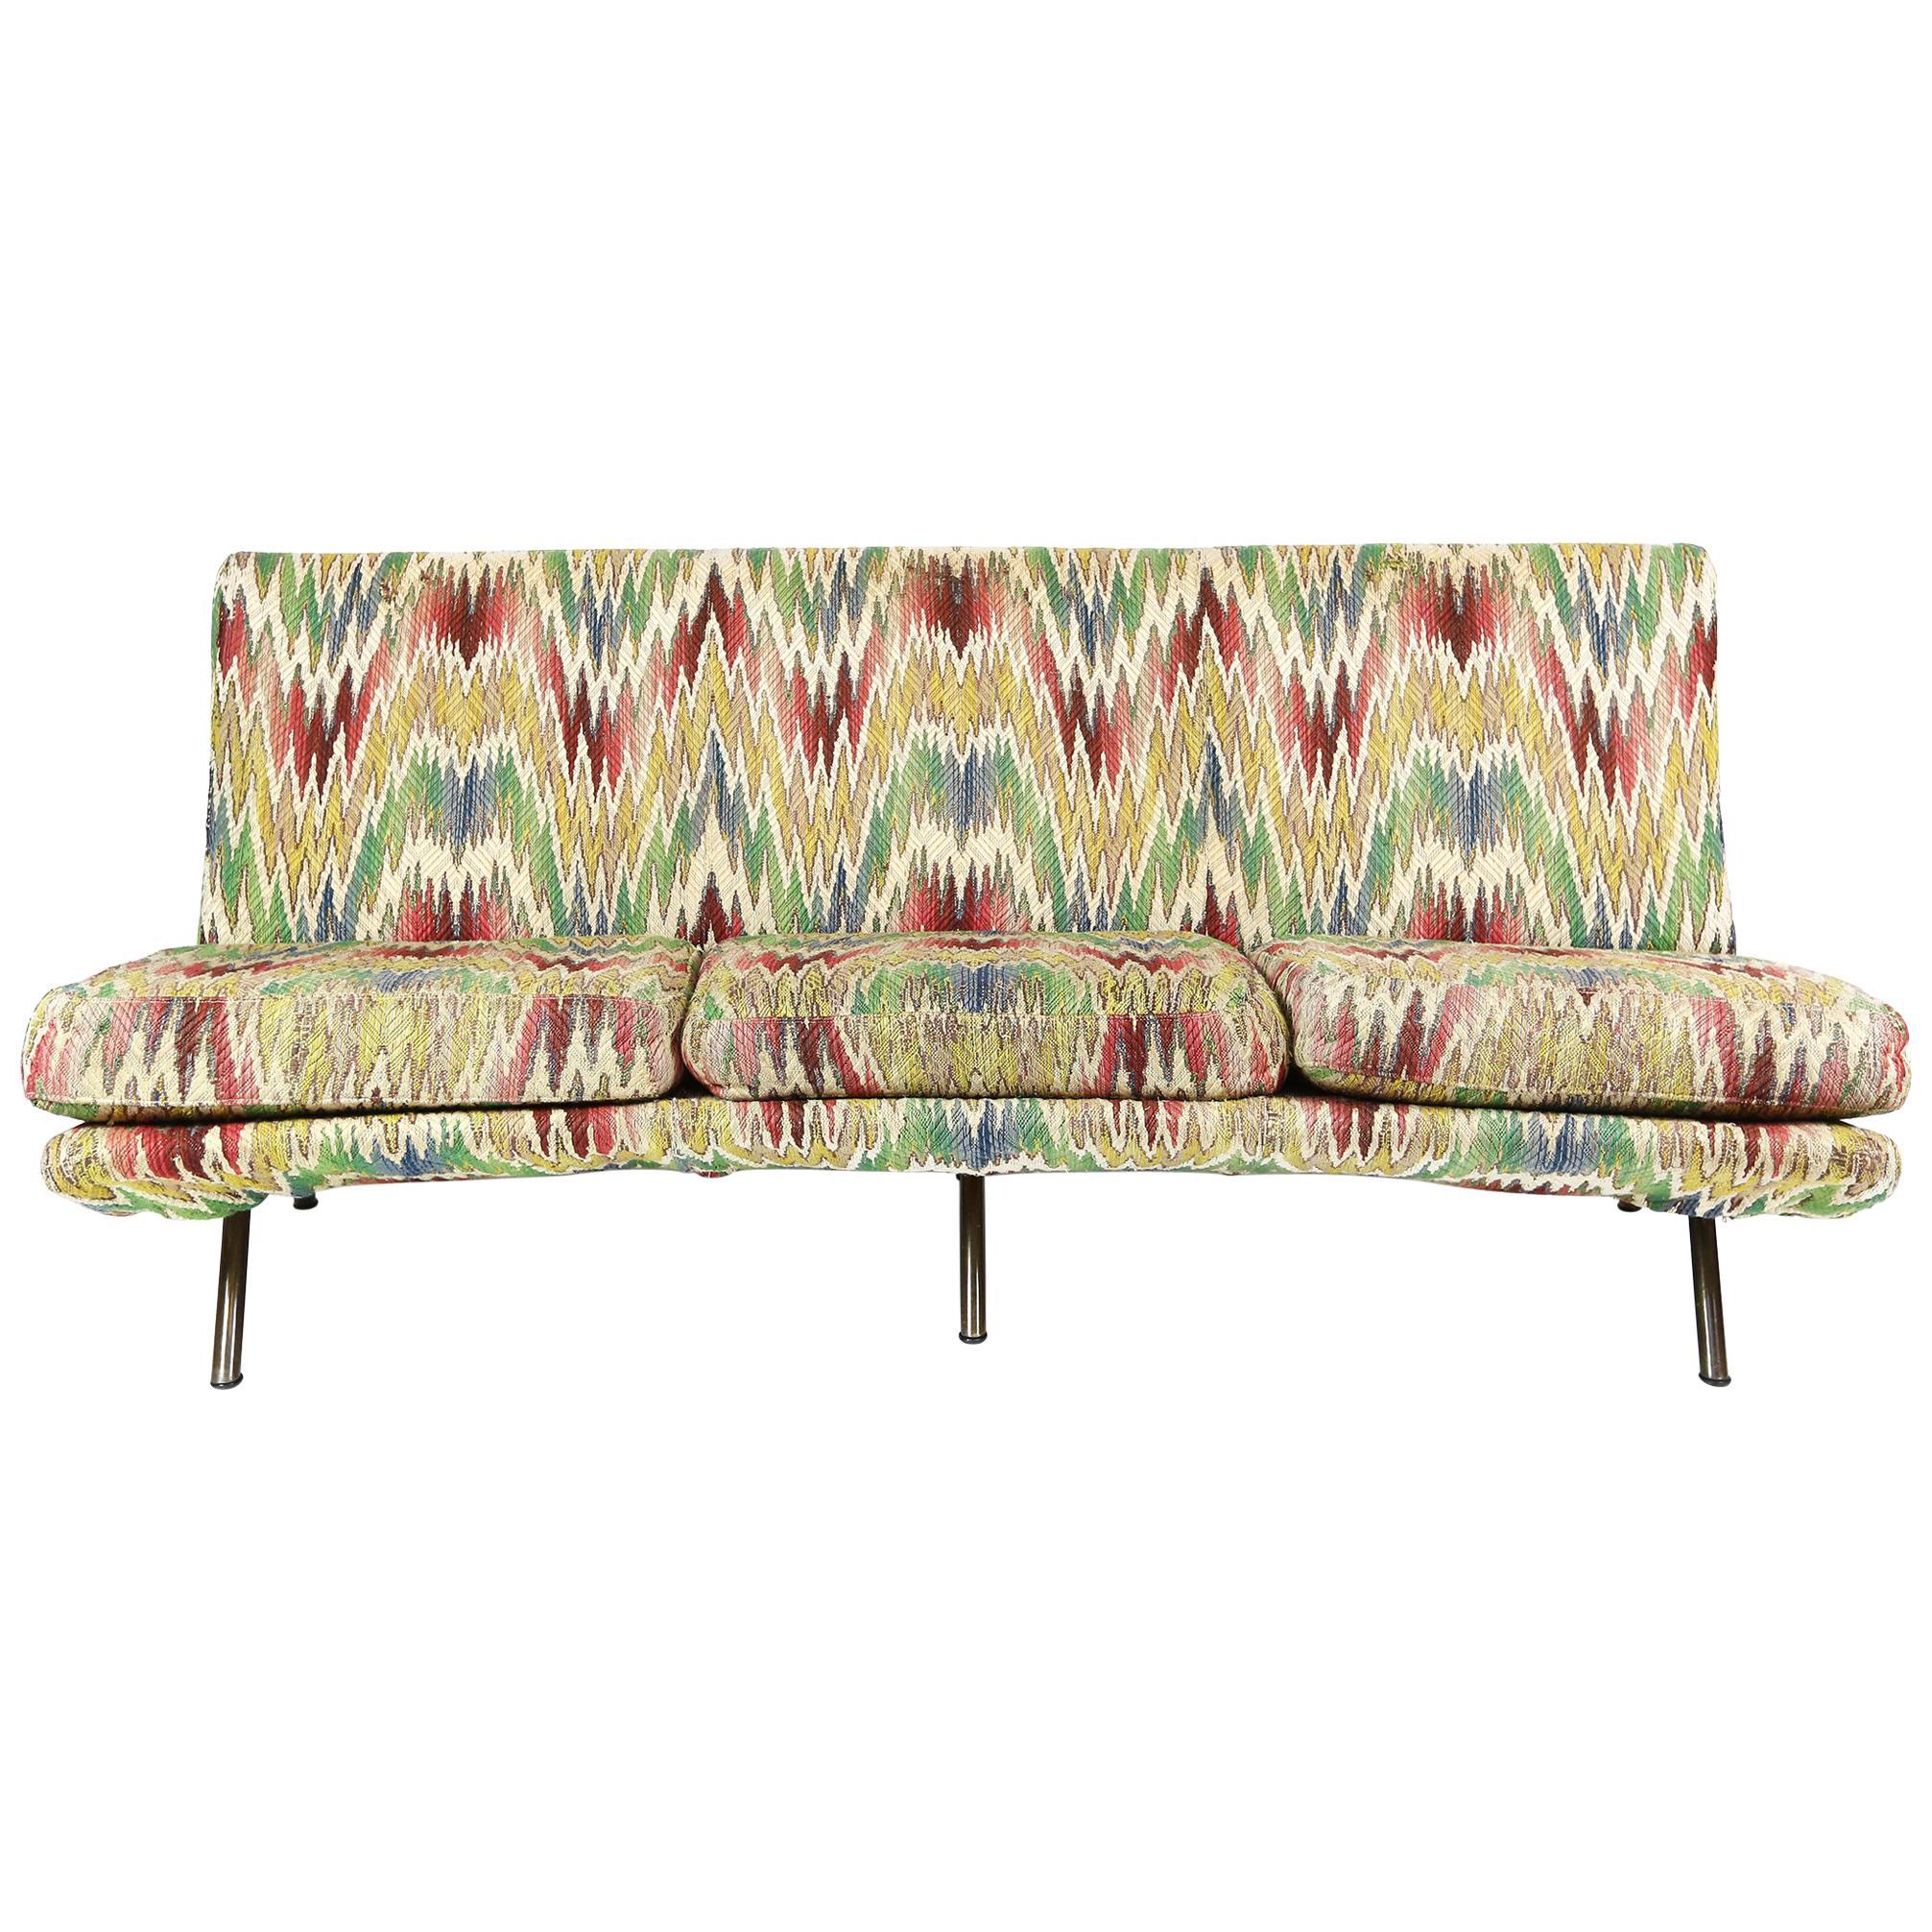 Marco Zanuso Three-Seat Triennale Sofa for Arflex, Italy, 1950s